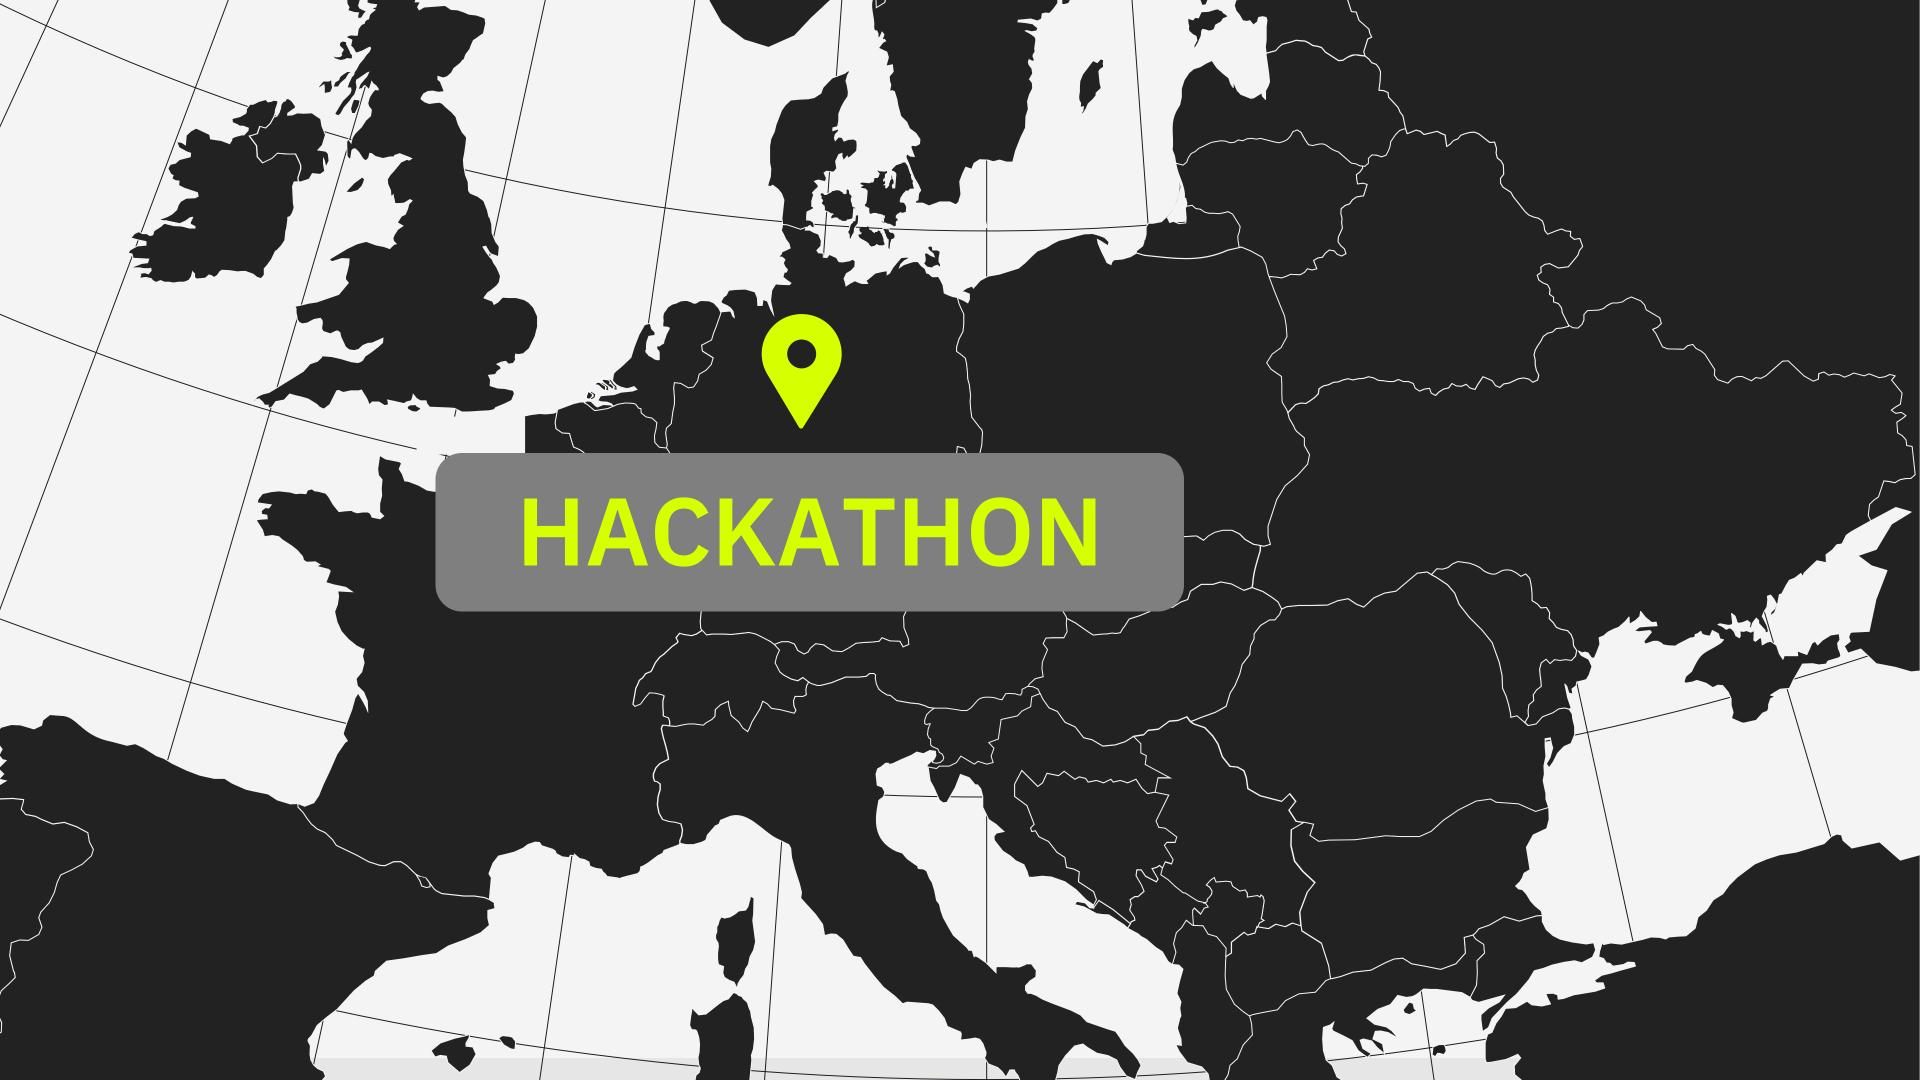 AWA hackathon in Germany soon…